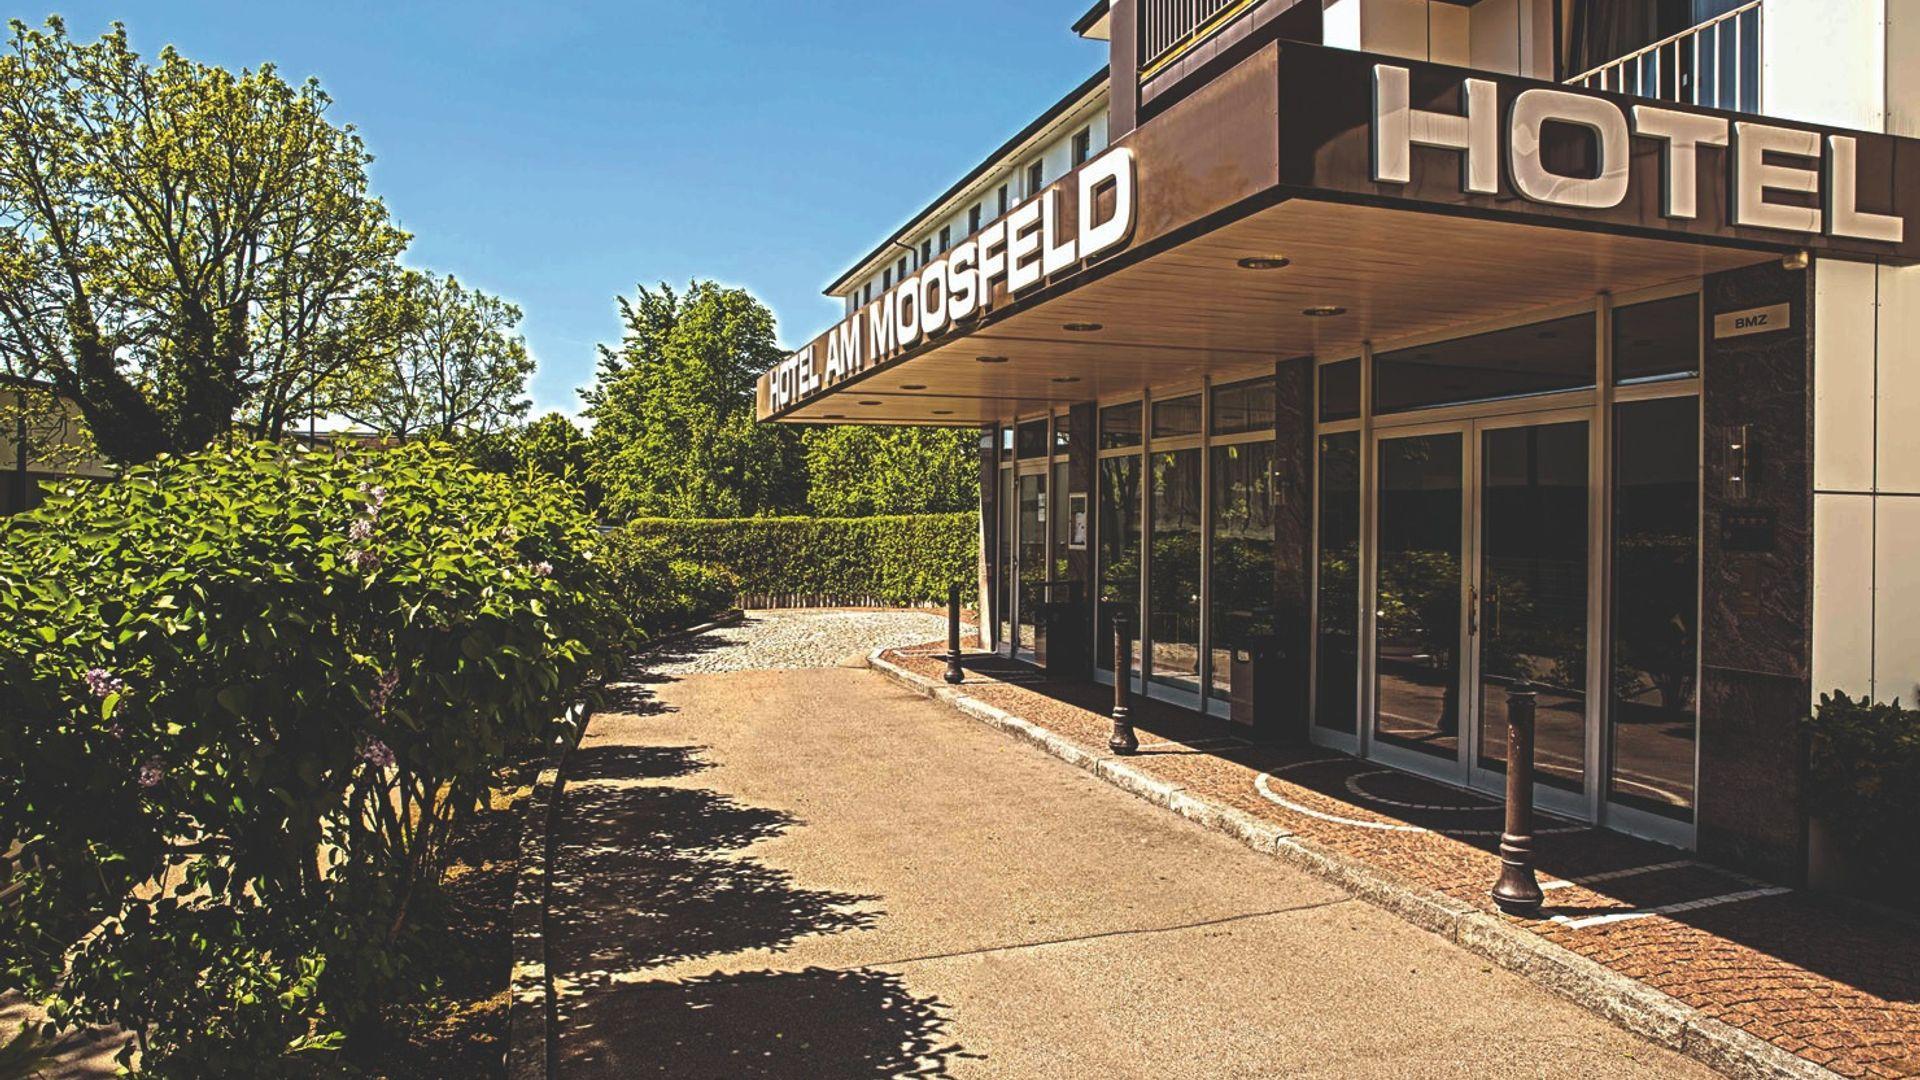 4* Hotel am Moosfeld München